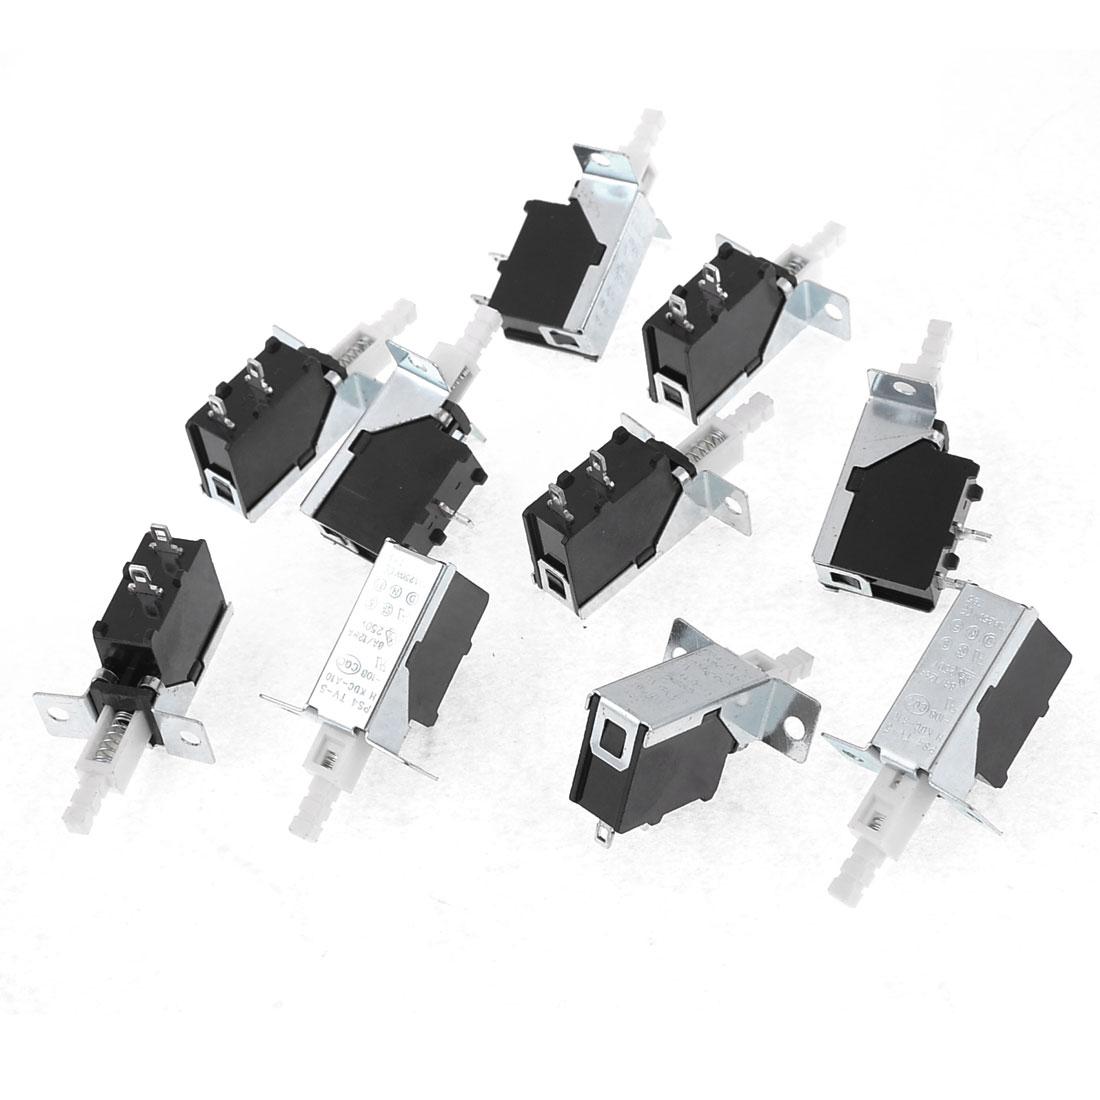 10 Pcs KDC-A10-10B AC 250V 10A SPST Push Button Power Switch